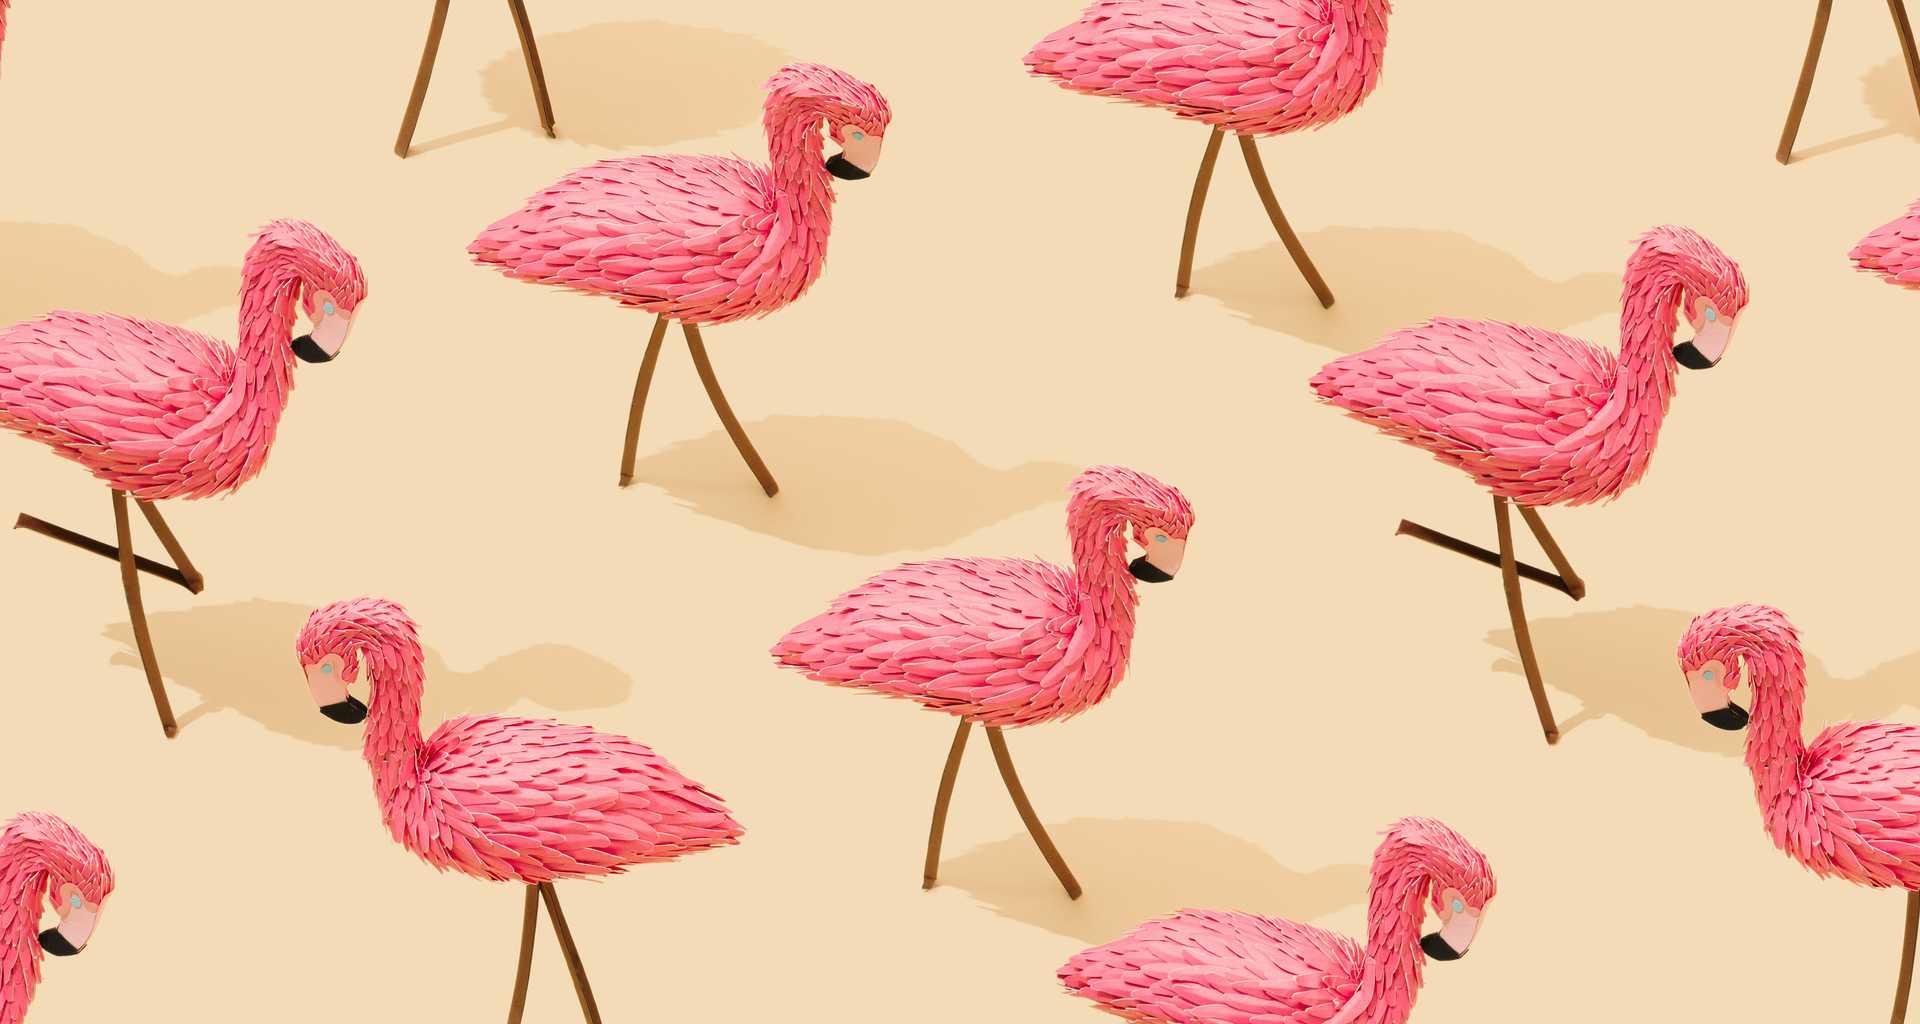 A hero background image of flamingos